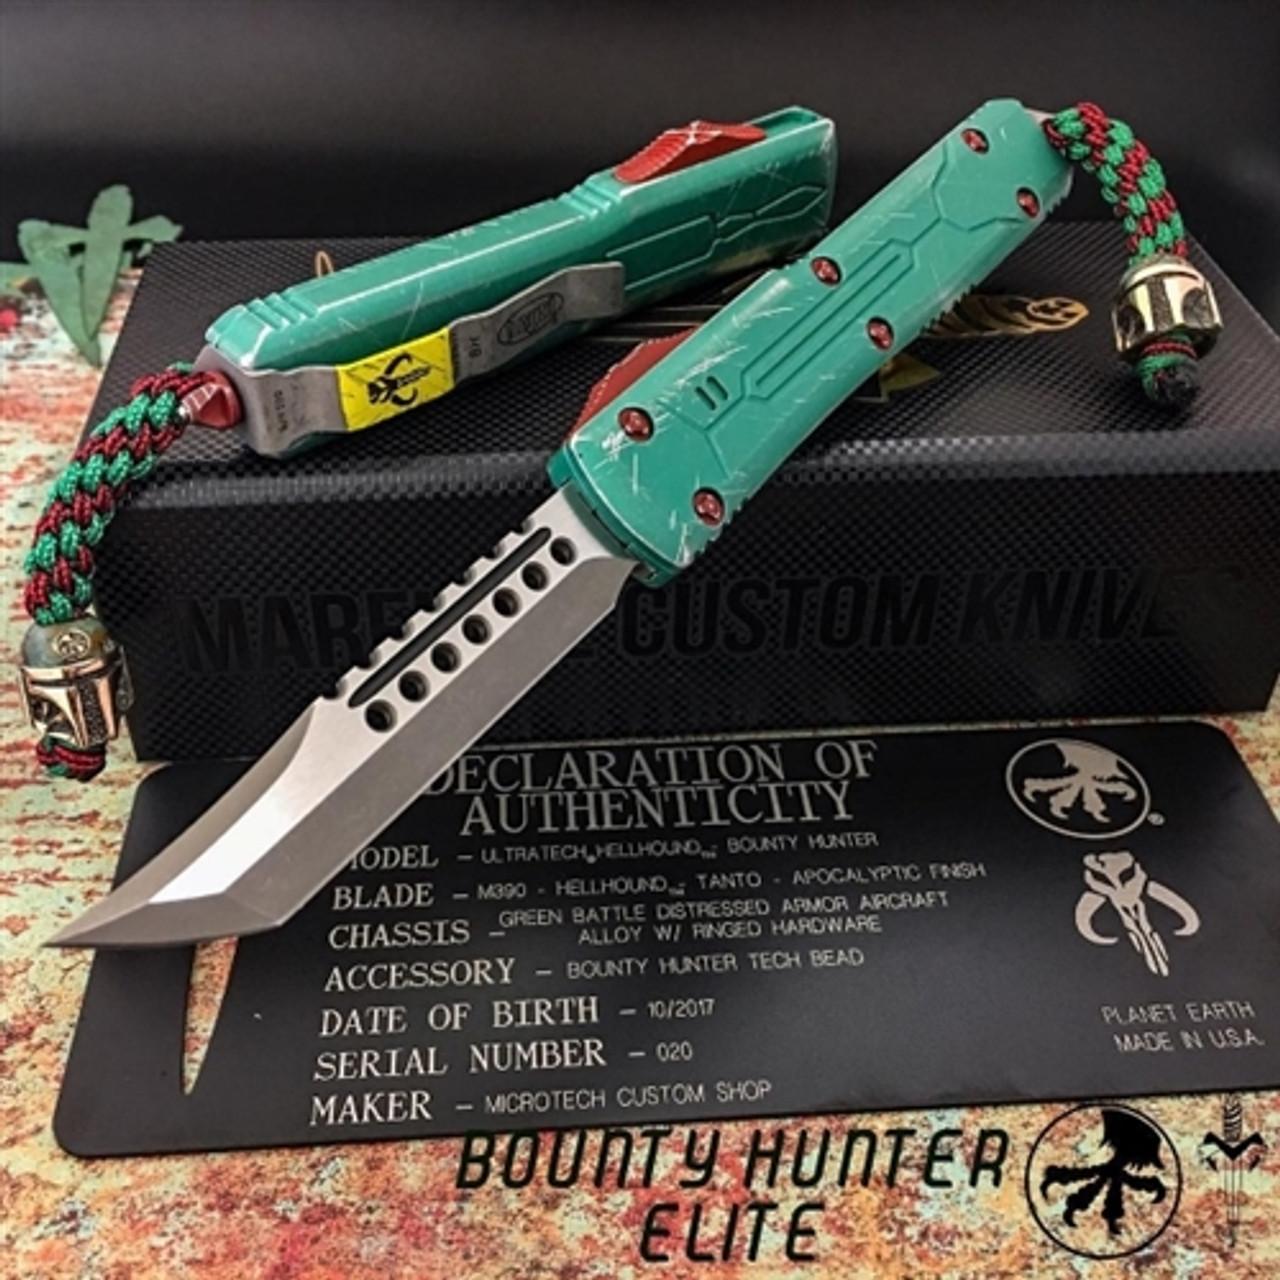 Marfione Custom Knives 119-10BHE Bounty Hunter Elite Ultratech Hellhound Tanto OTF Auto Knife, Apocalyptic Stonewash Blade